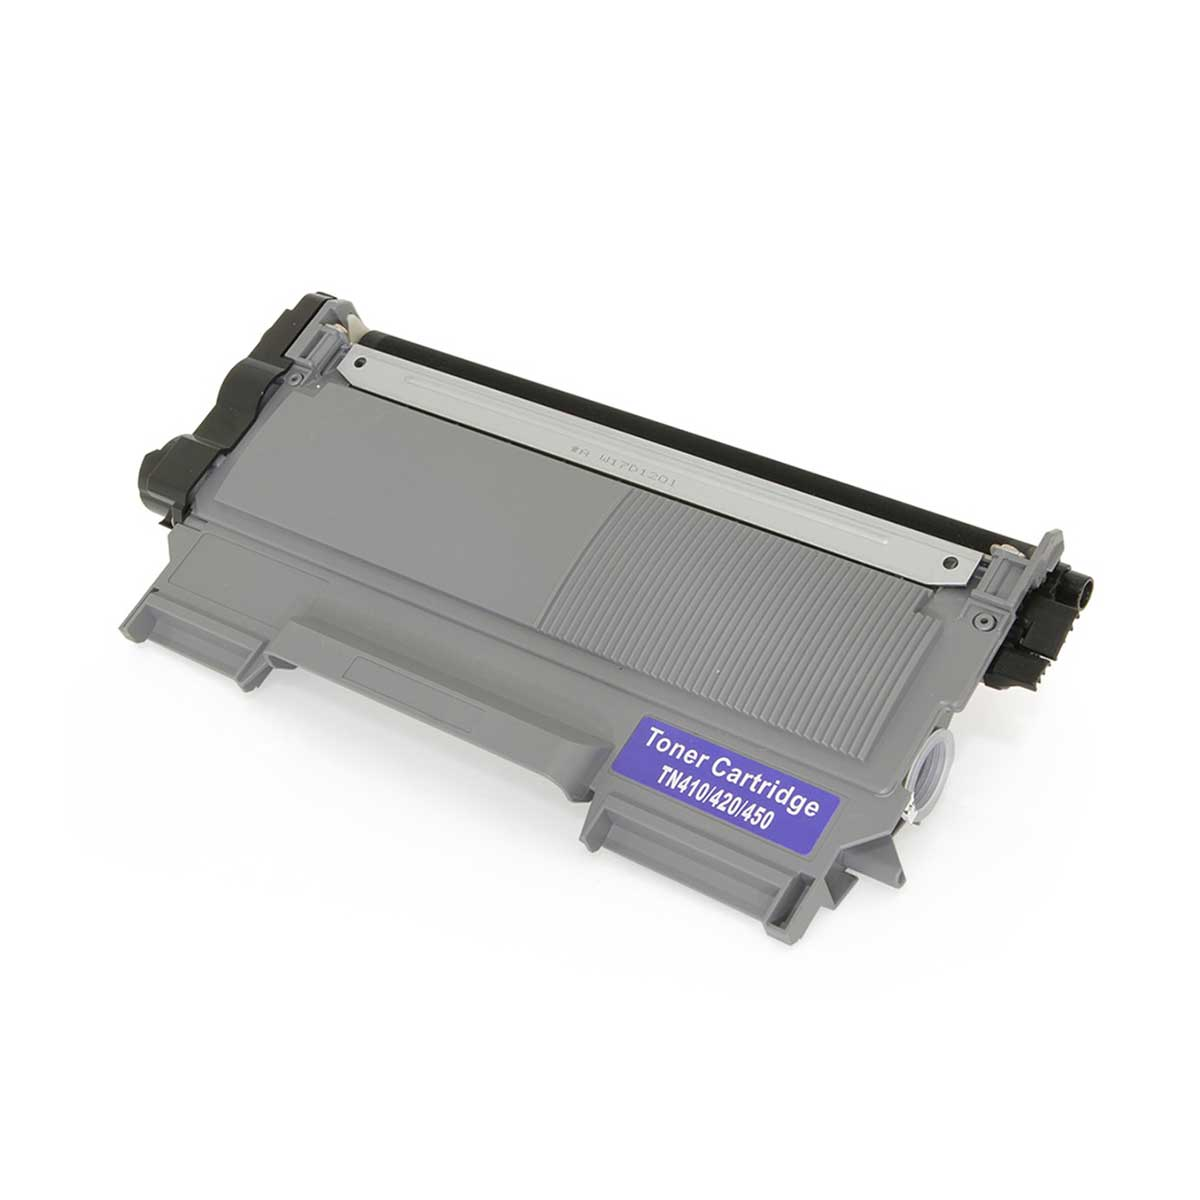 Toner Compatível com Brother TN-410 HL2130 HL2240 HL2230 DCP7055 MFC7360N MFC7460DN - 2.600 Páginas - Cartucho & Cia